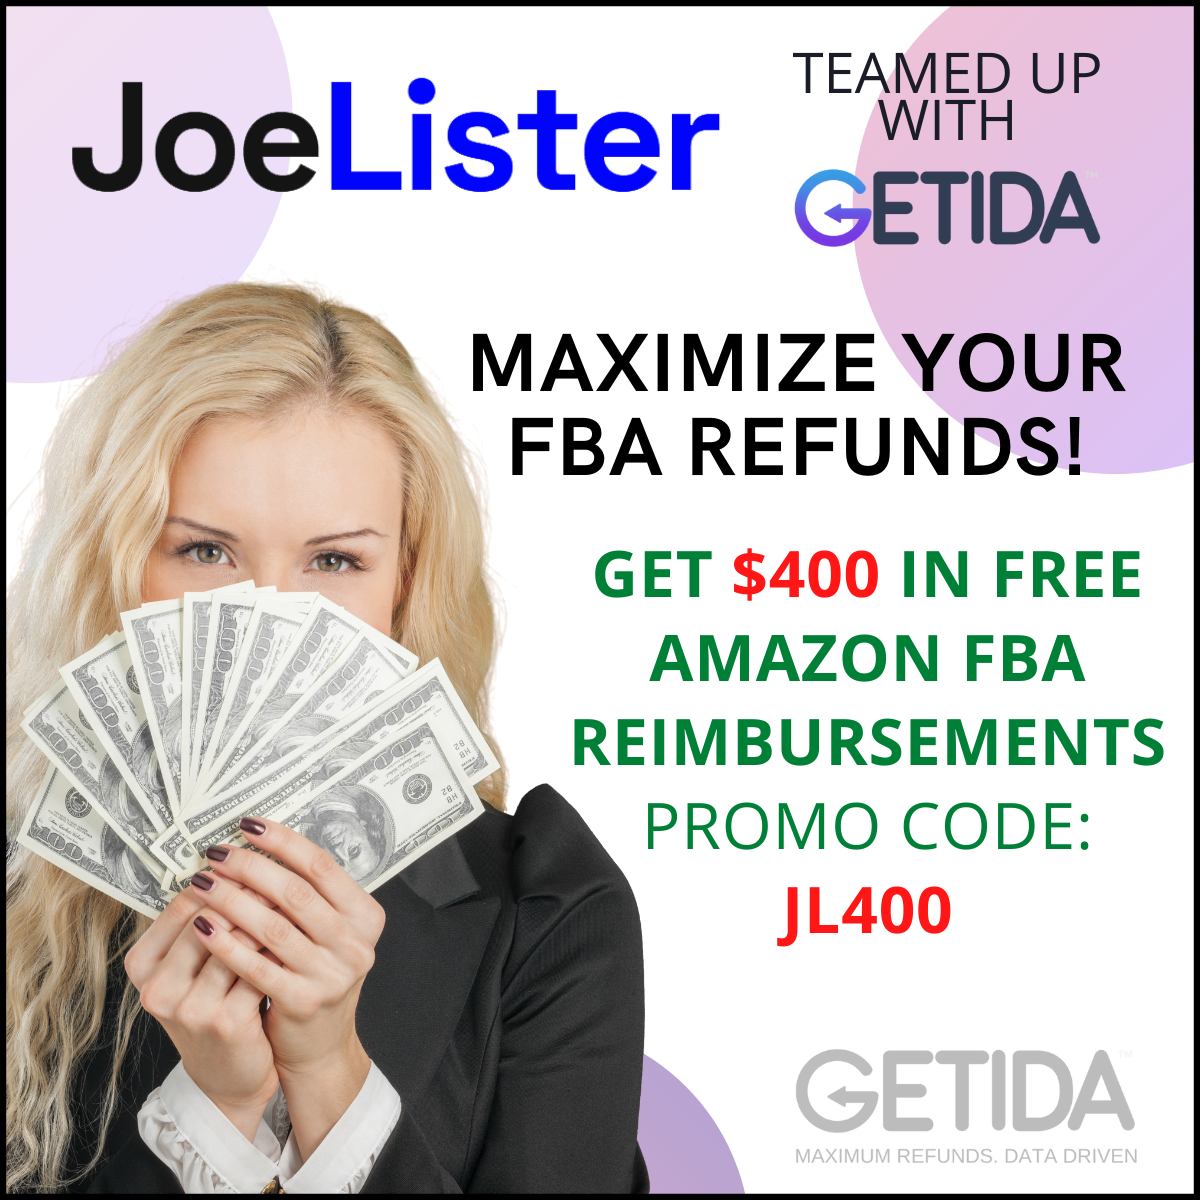 JoeLister & GETIDA Partnership